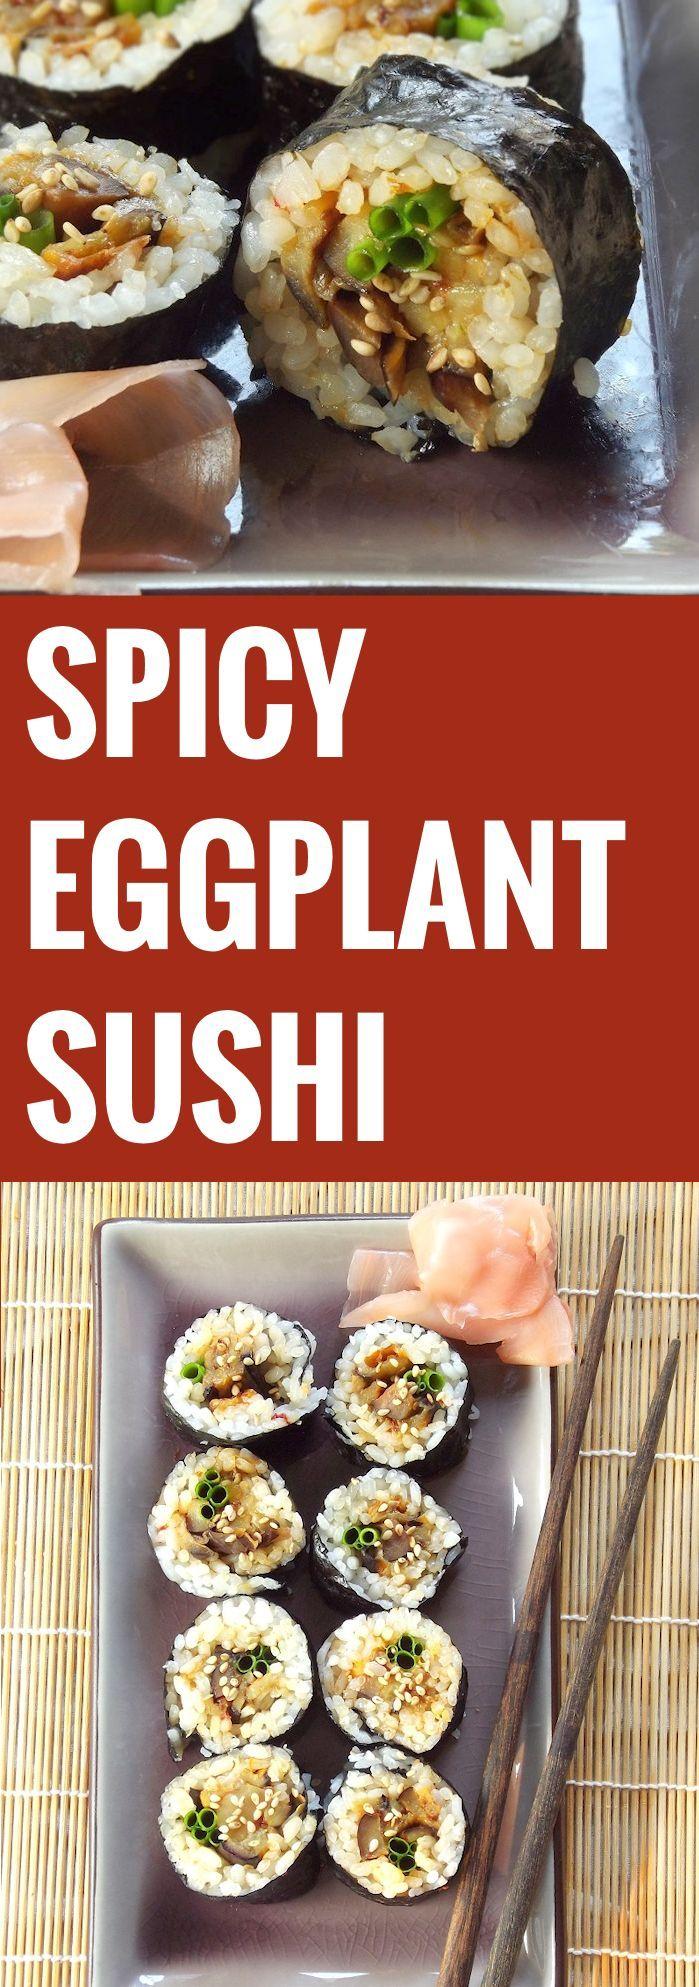 Spicy Eggplant Sushi